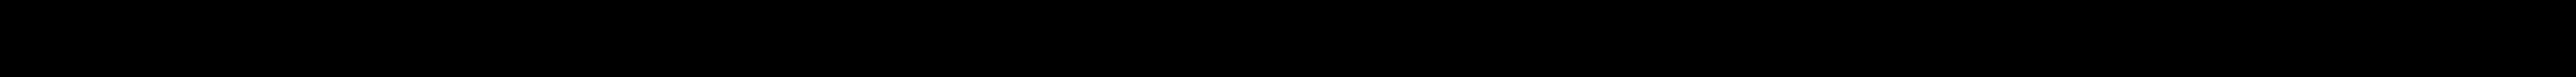 svart bølge lang.png